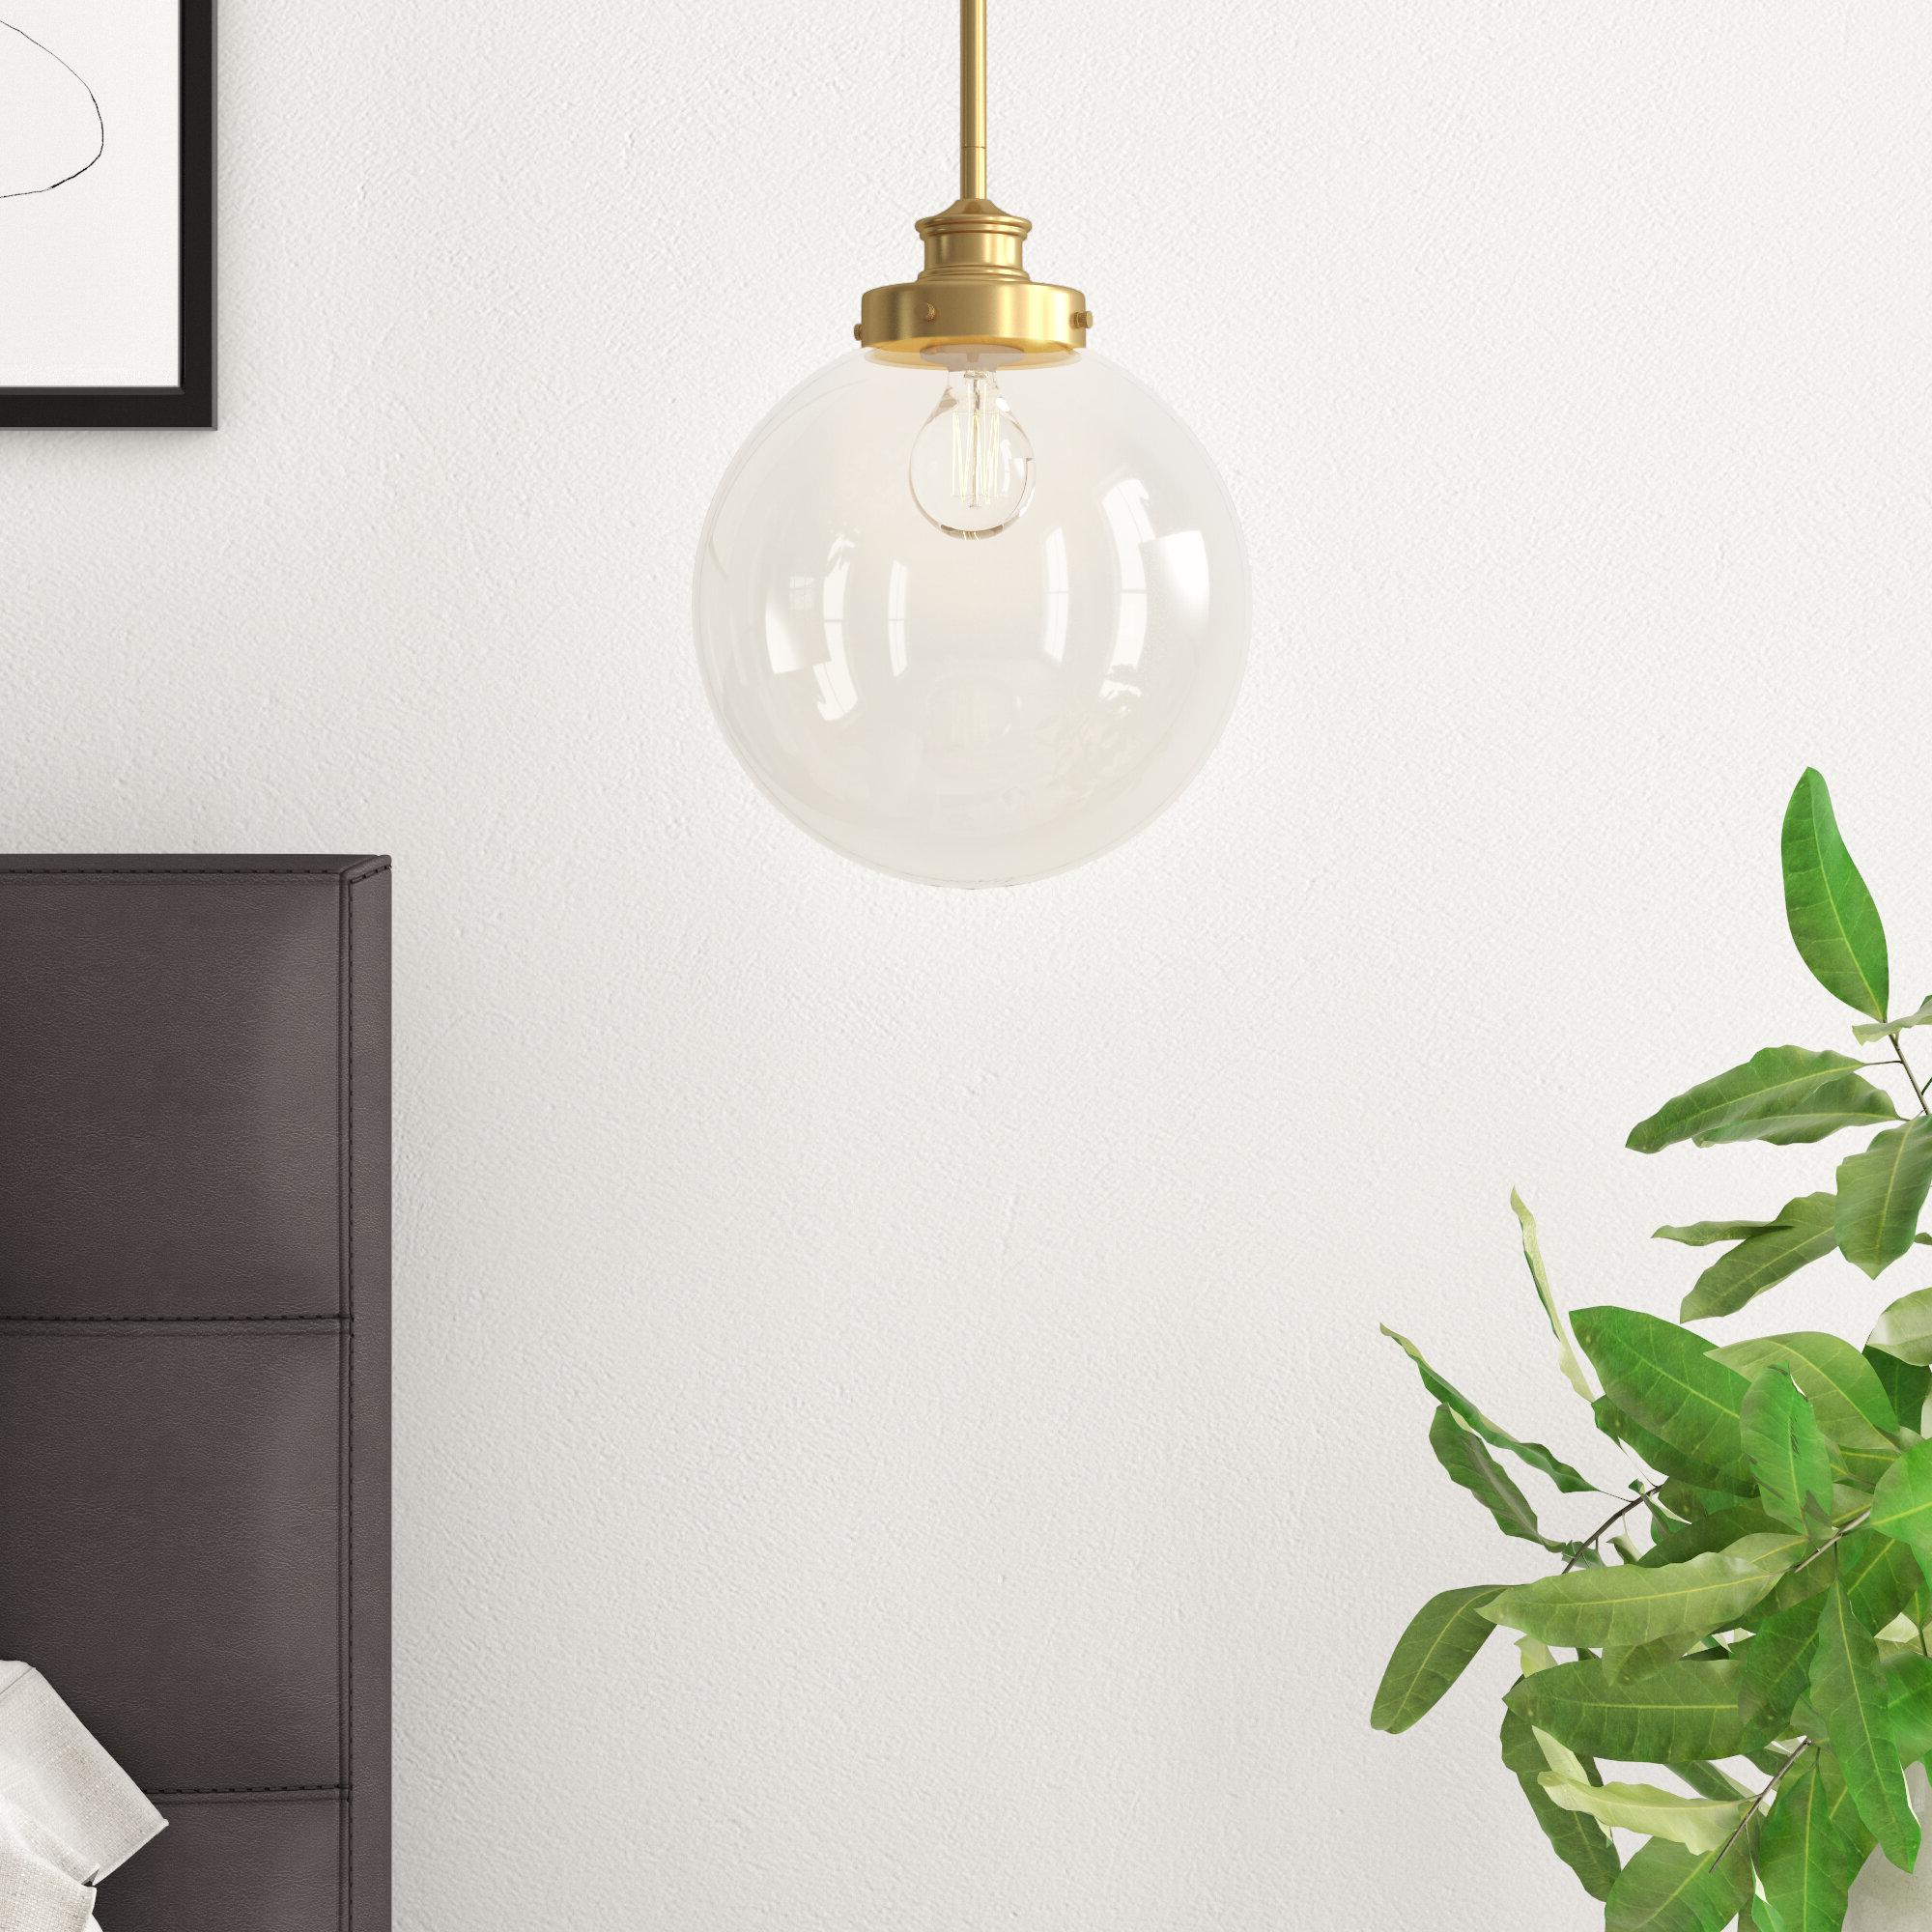 Cayden 1 Light Single Globe Pendant With Regard To Well Liked Cayden 1 Light Single Globe Pendants (View 6 of 25)